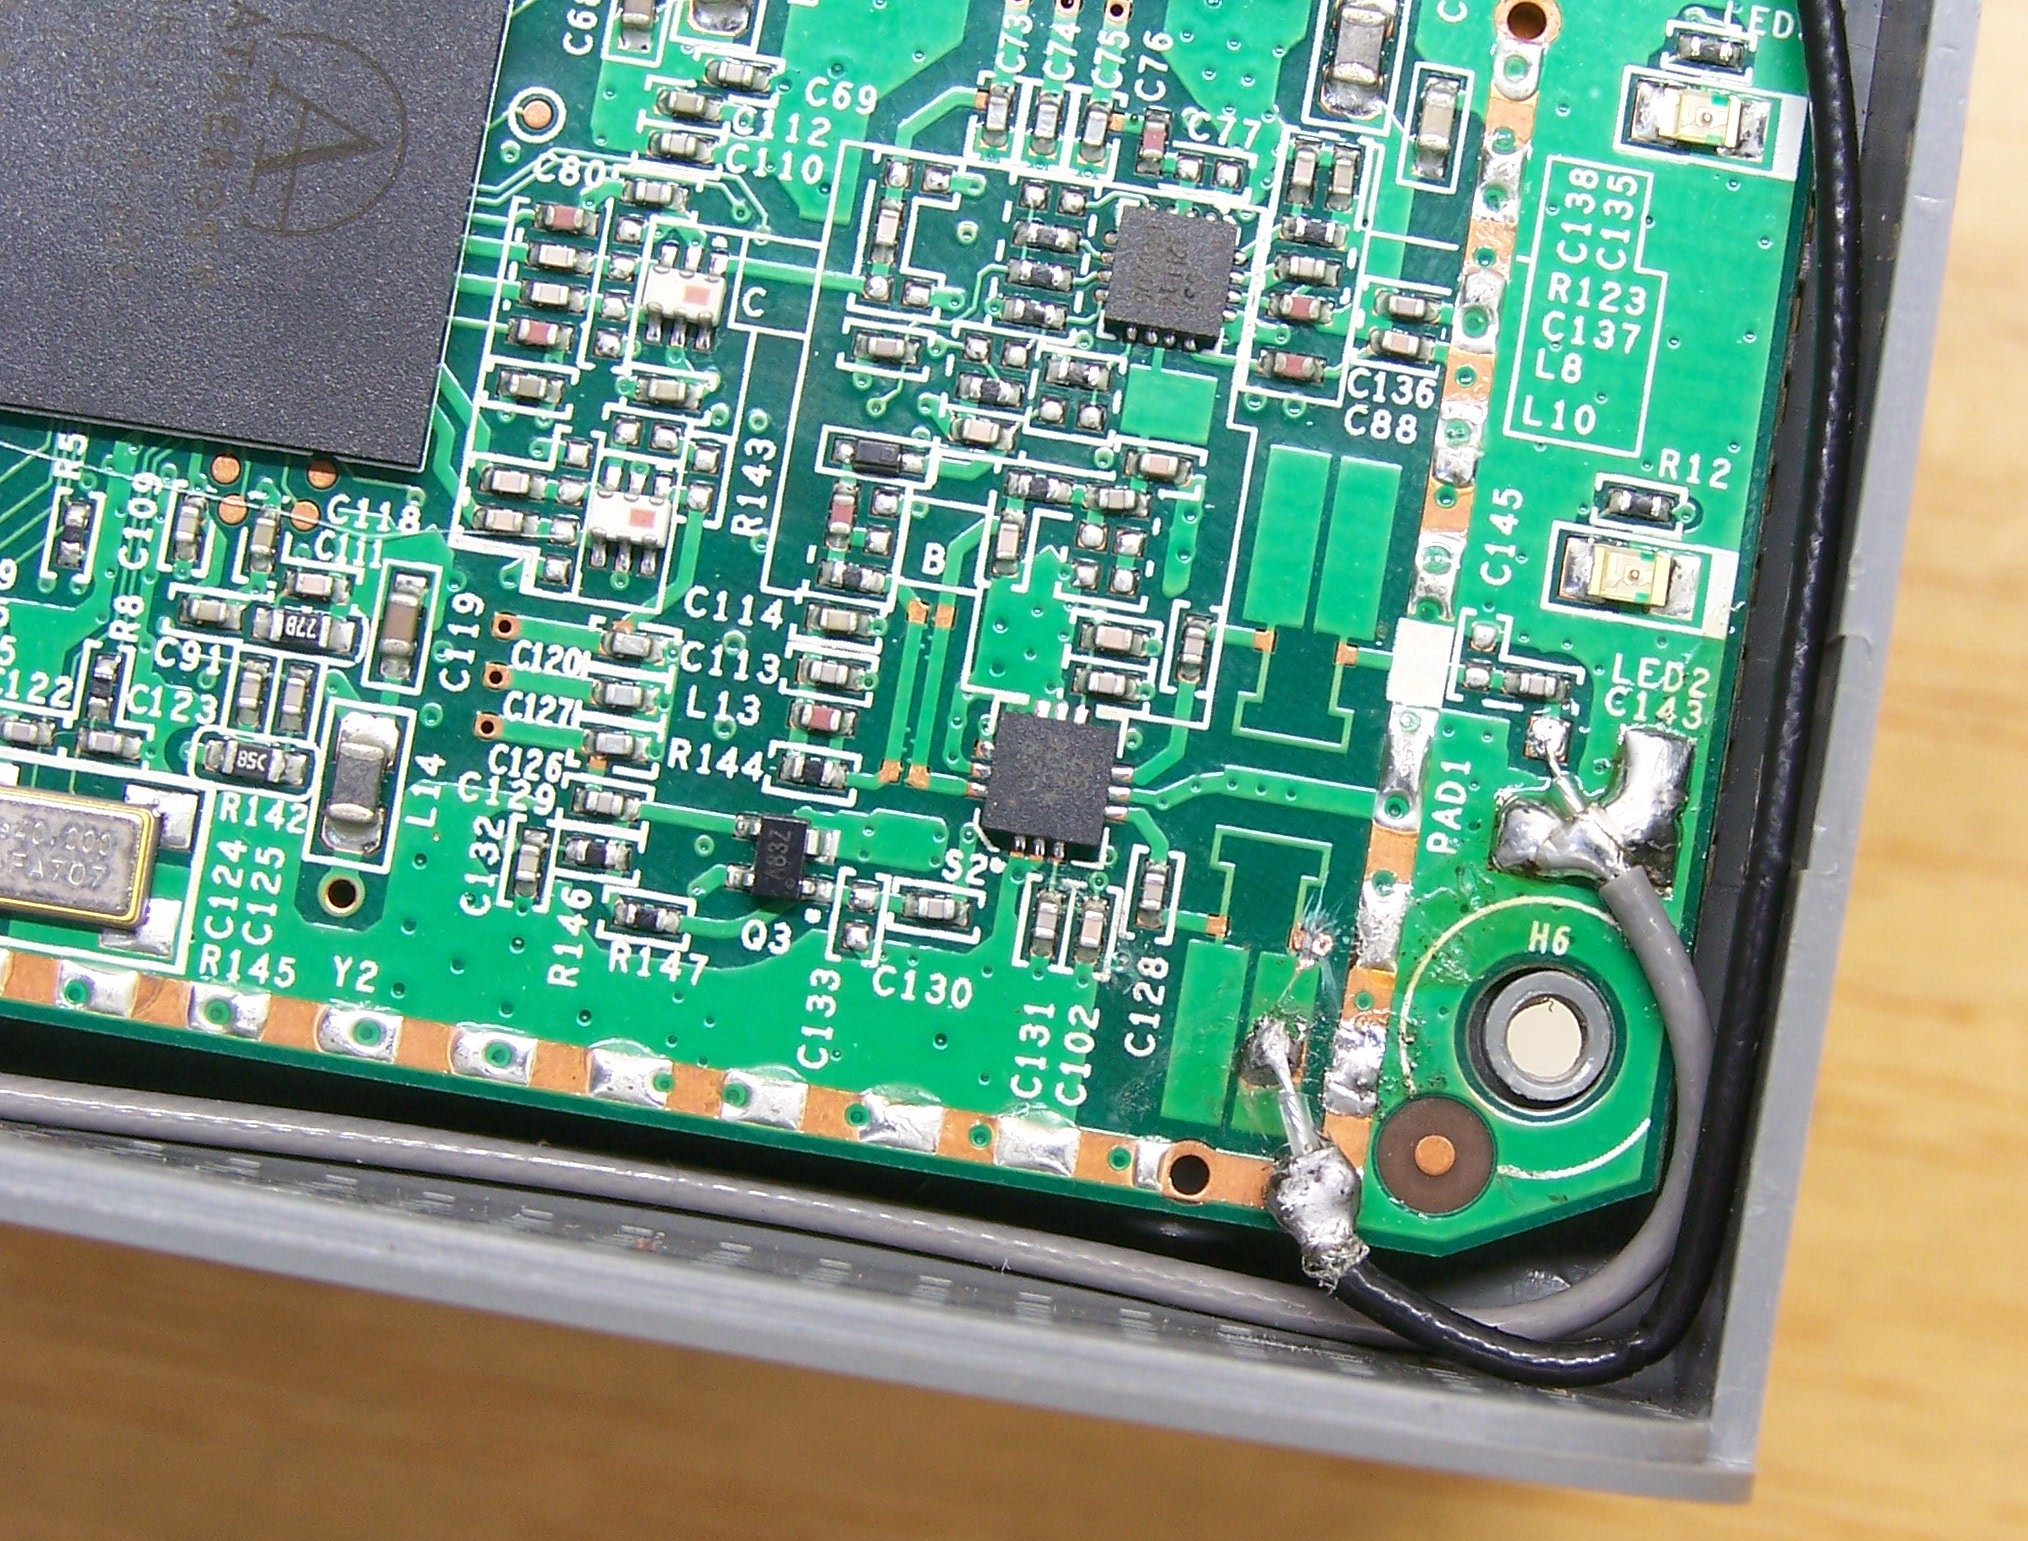 fon2200-2nd-antenna-mod-soldering-detail.jpg